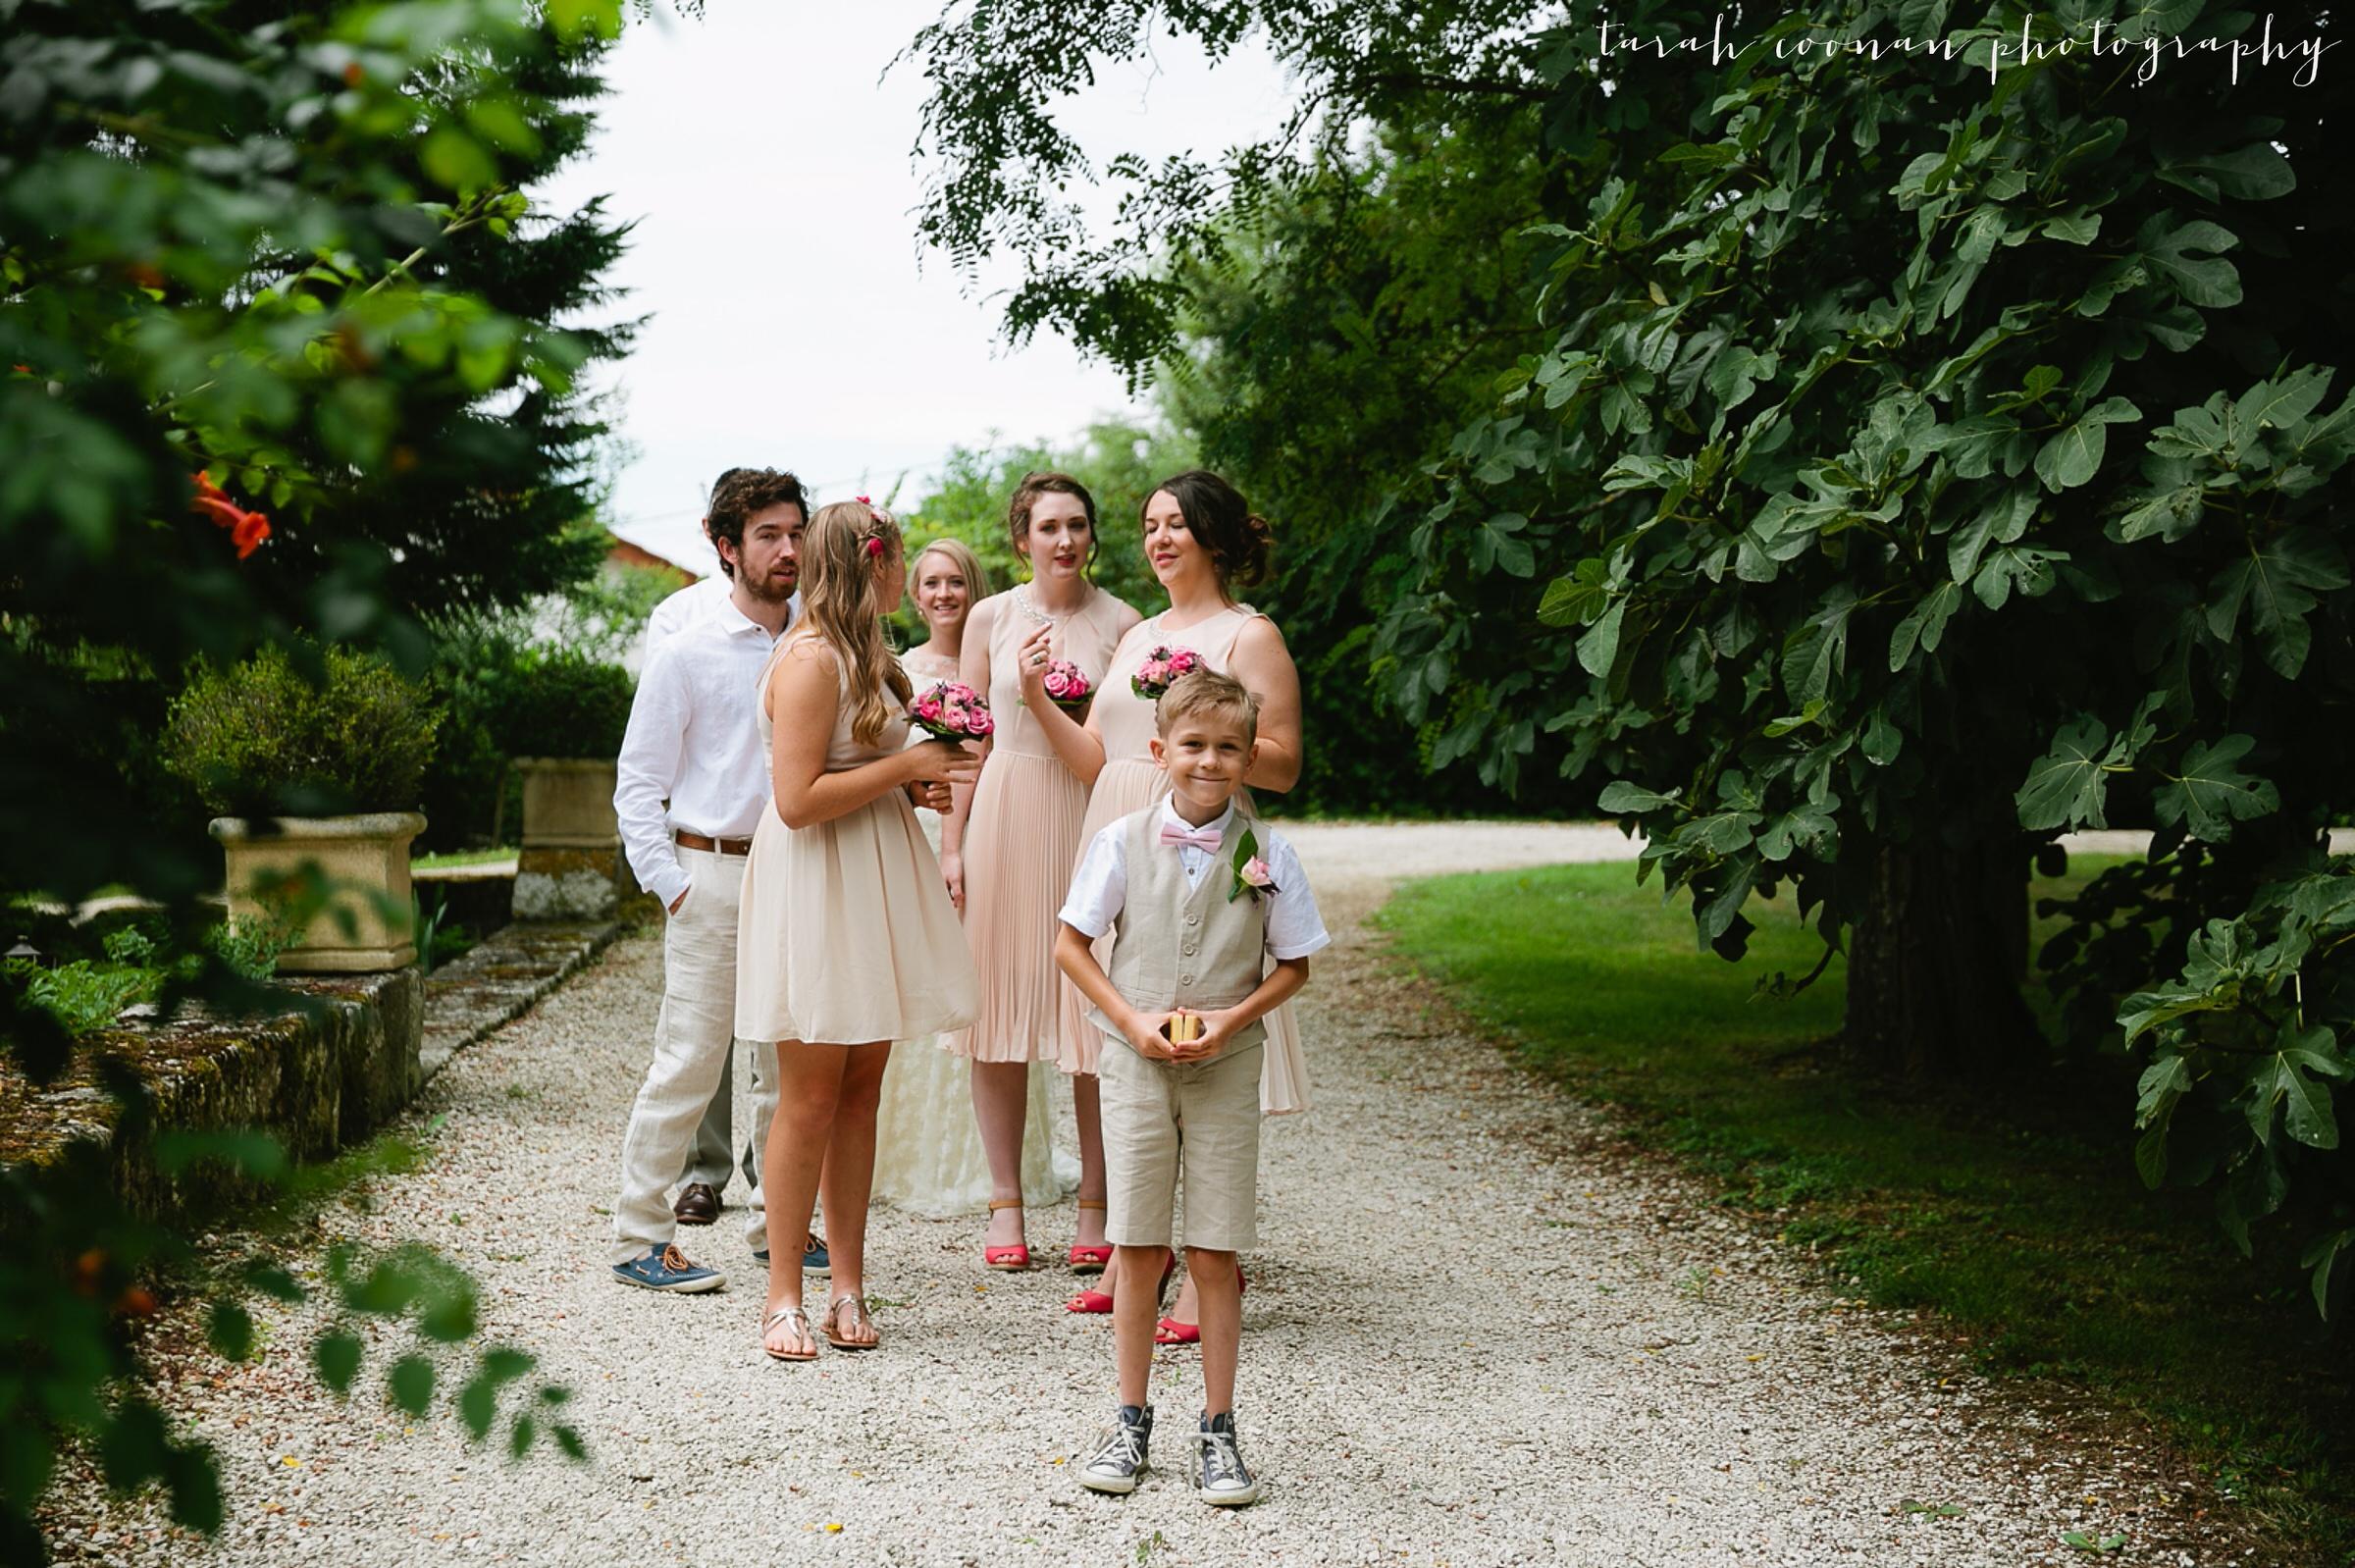 brighton-wedding-photographer9